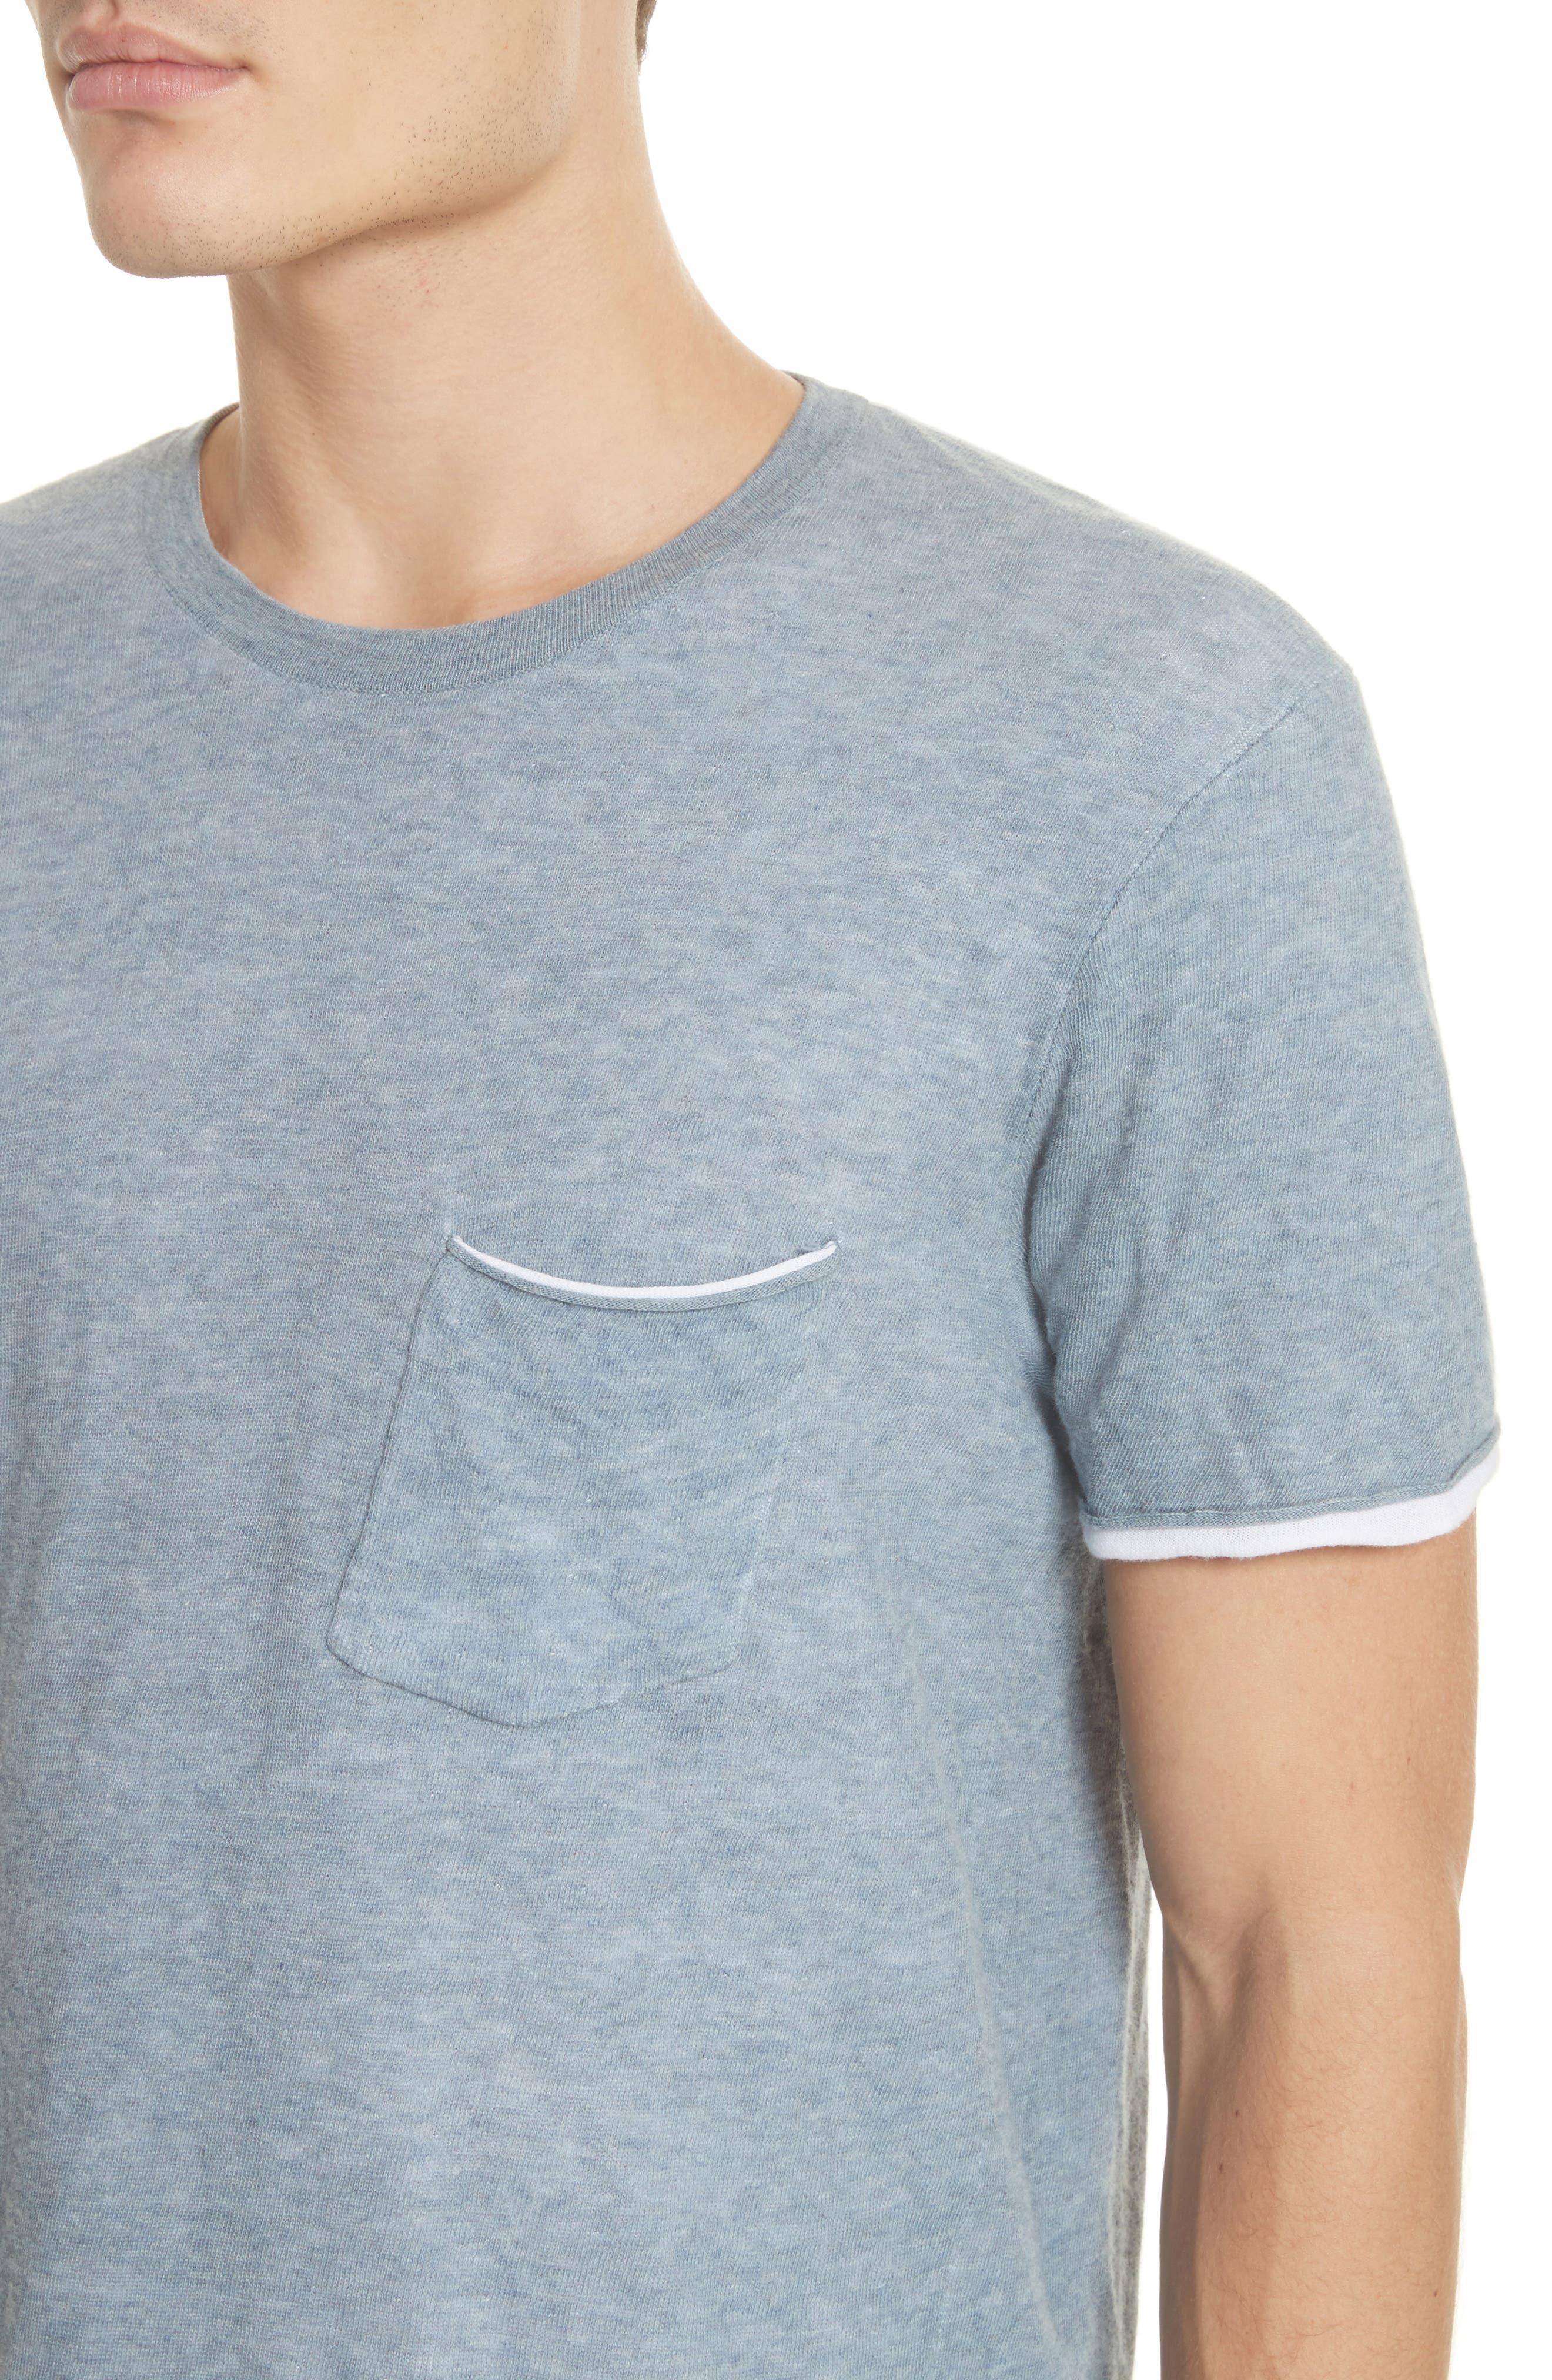 Tripp Pocket T-Shirt,                             Alternate thumbnail 4, color,                             455